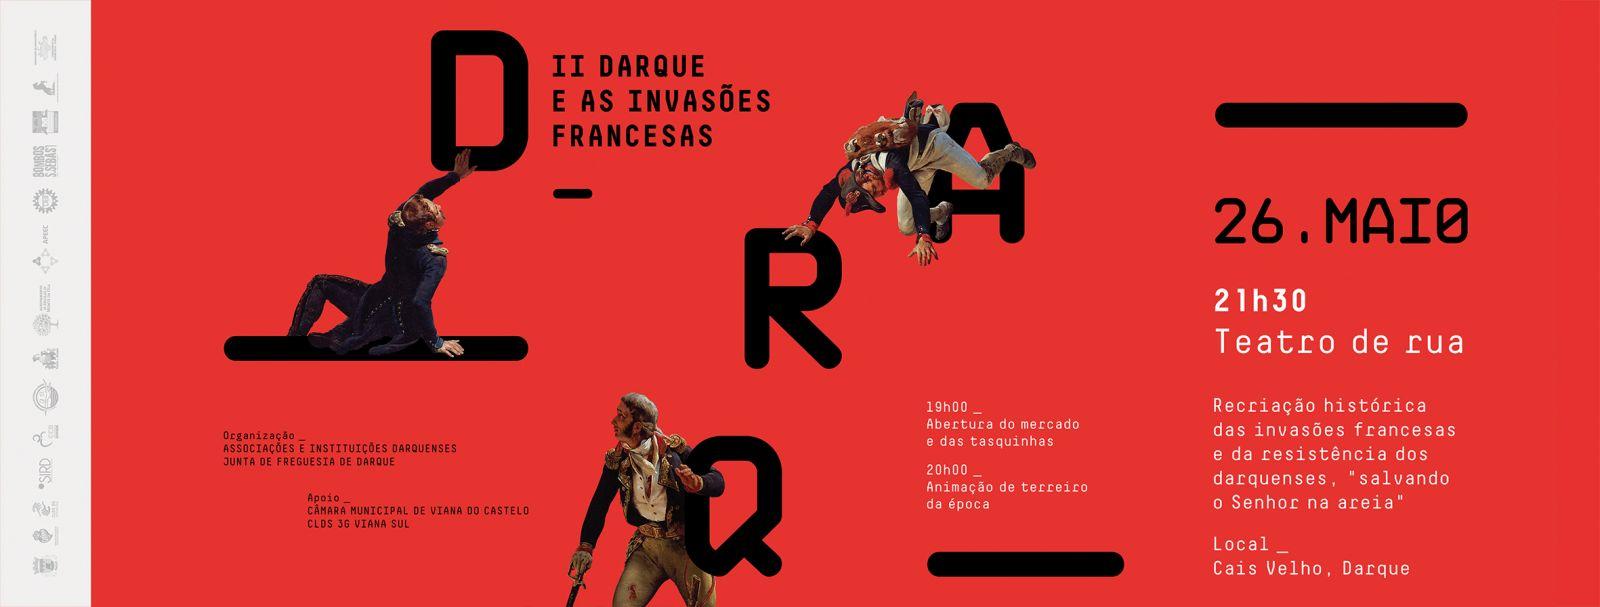 darque2(1)